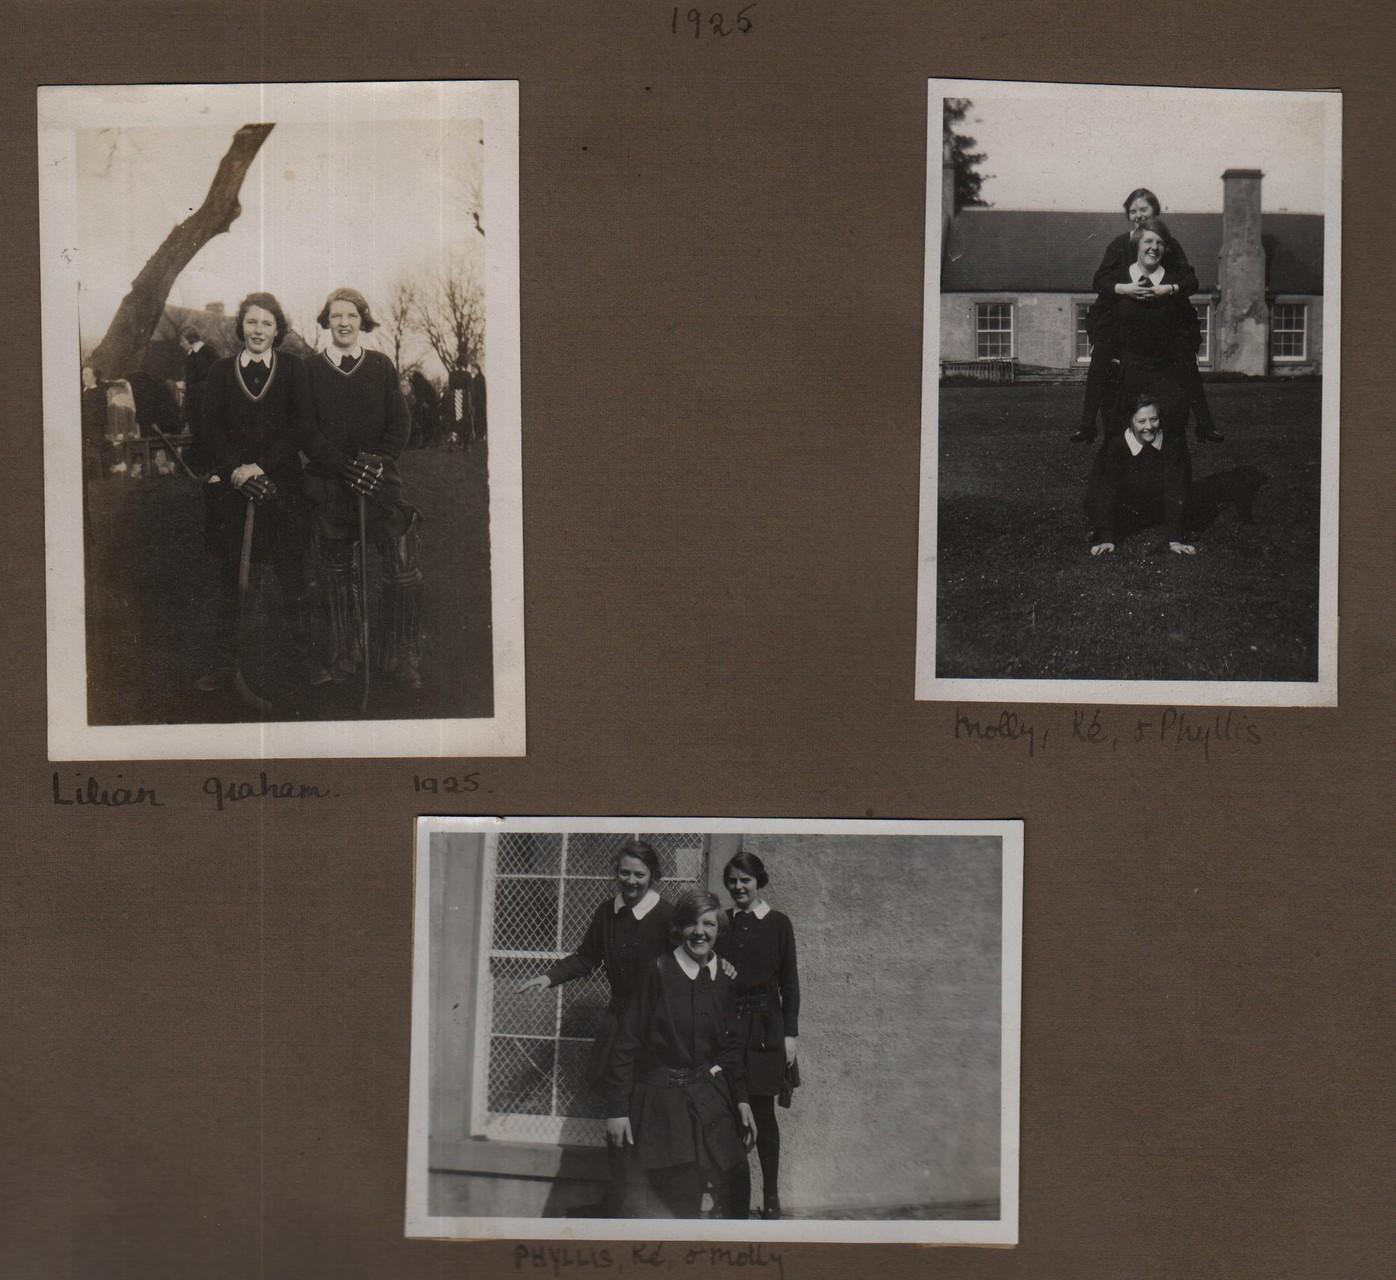 1925: Lilian, Graham; Molly, Ke, Phyllis; Phyllis, Ke, Molly